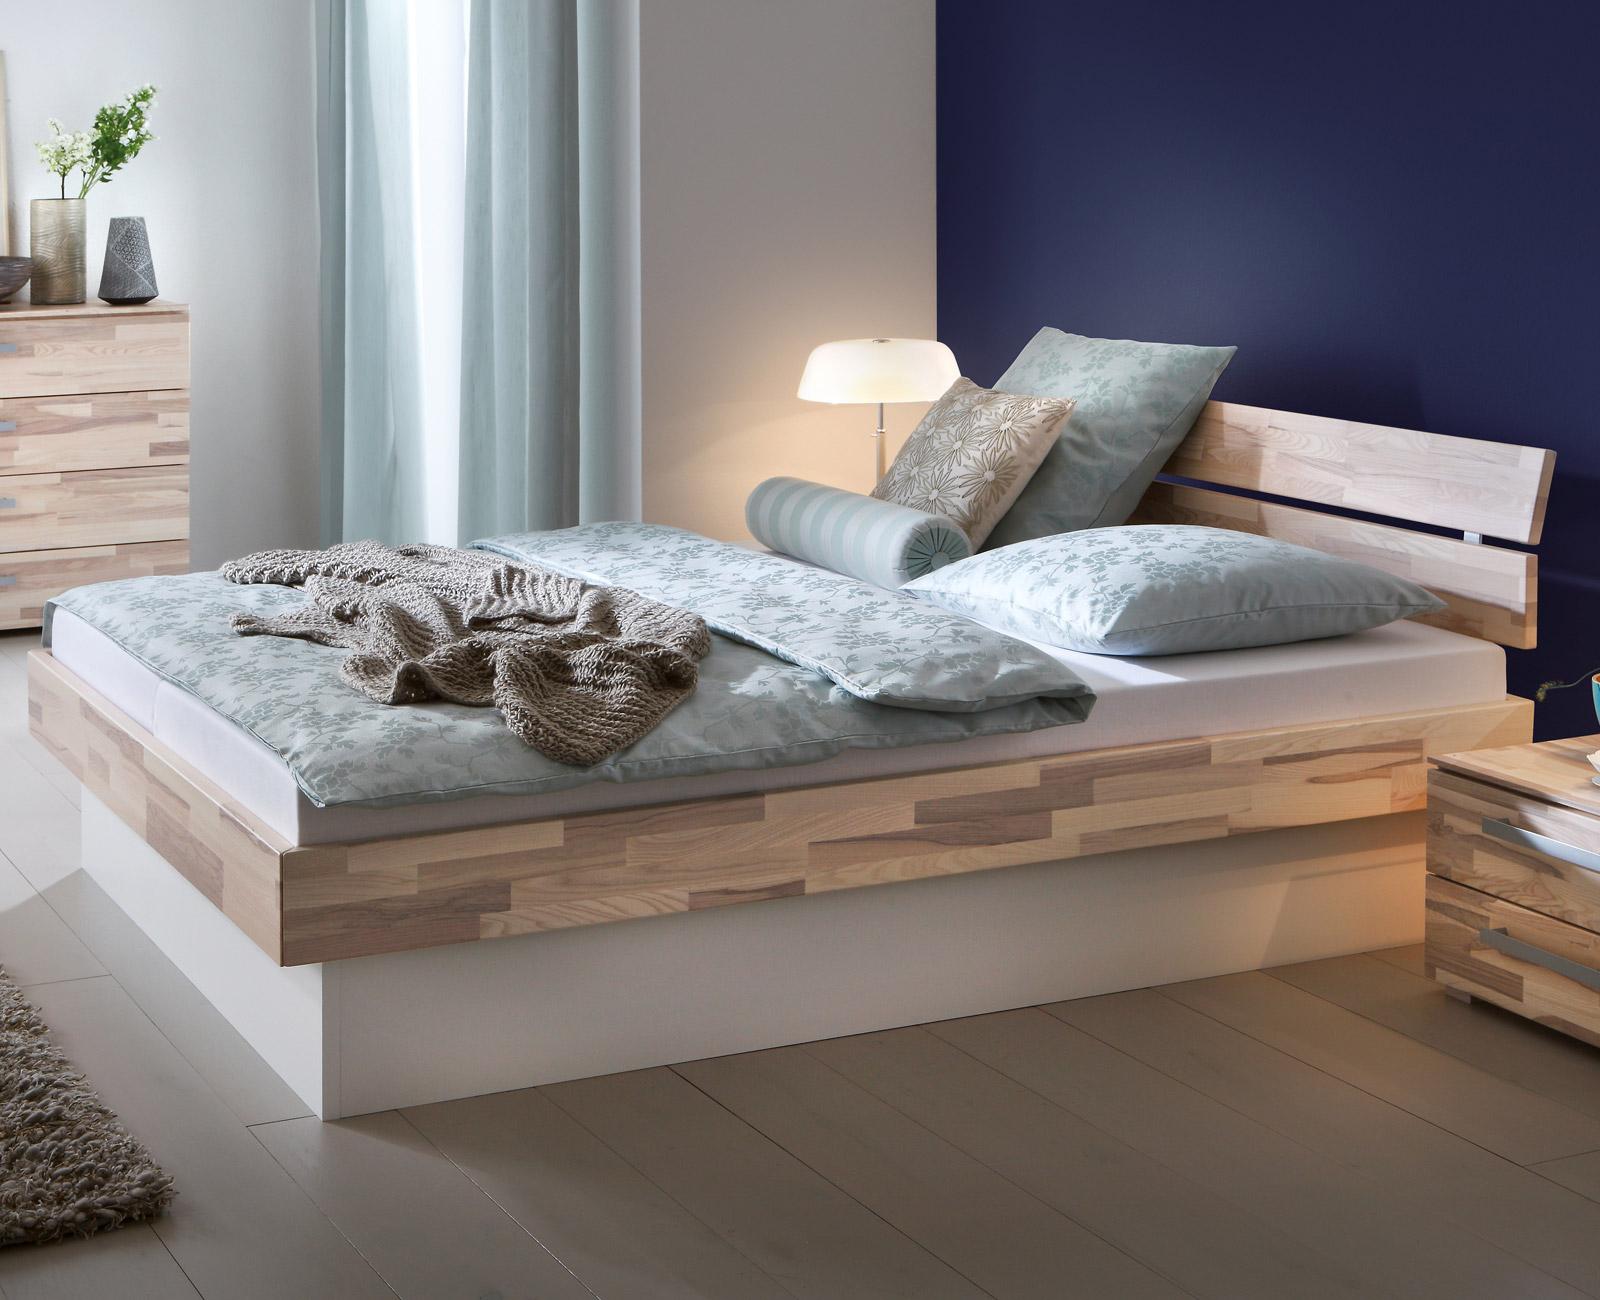 Full Size of Sockelbett Aus Heller Kernesche Mit Bettkasten Partido Bett Www.betten.de